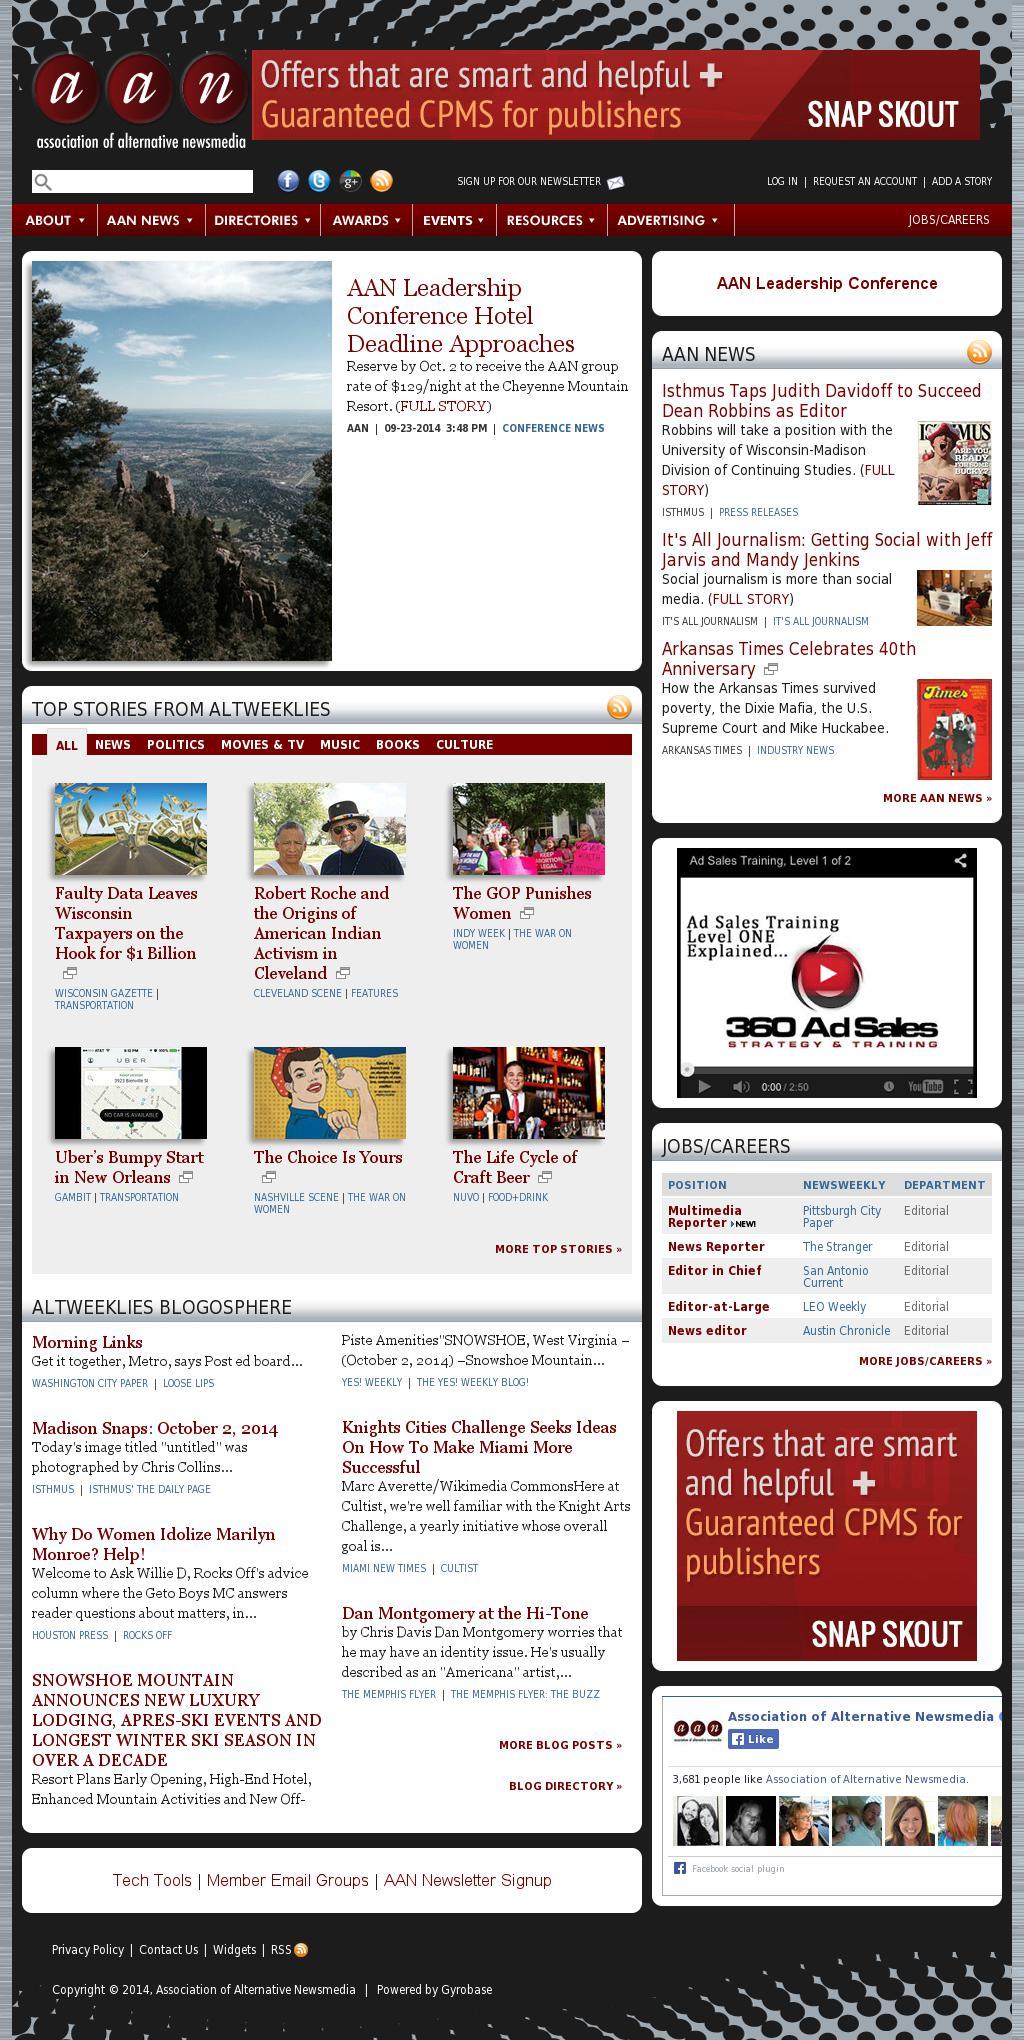 Association of Alternative Newsmedia at Thursday Oct. 2, 2014, 1 p.m. UTC